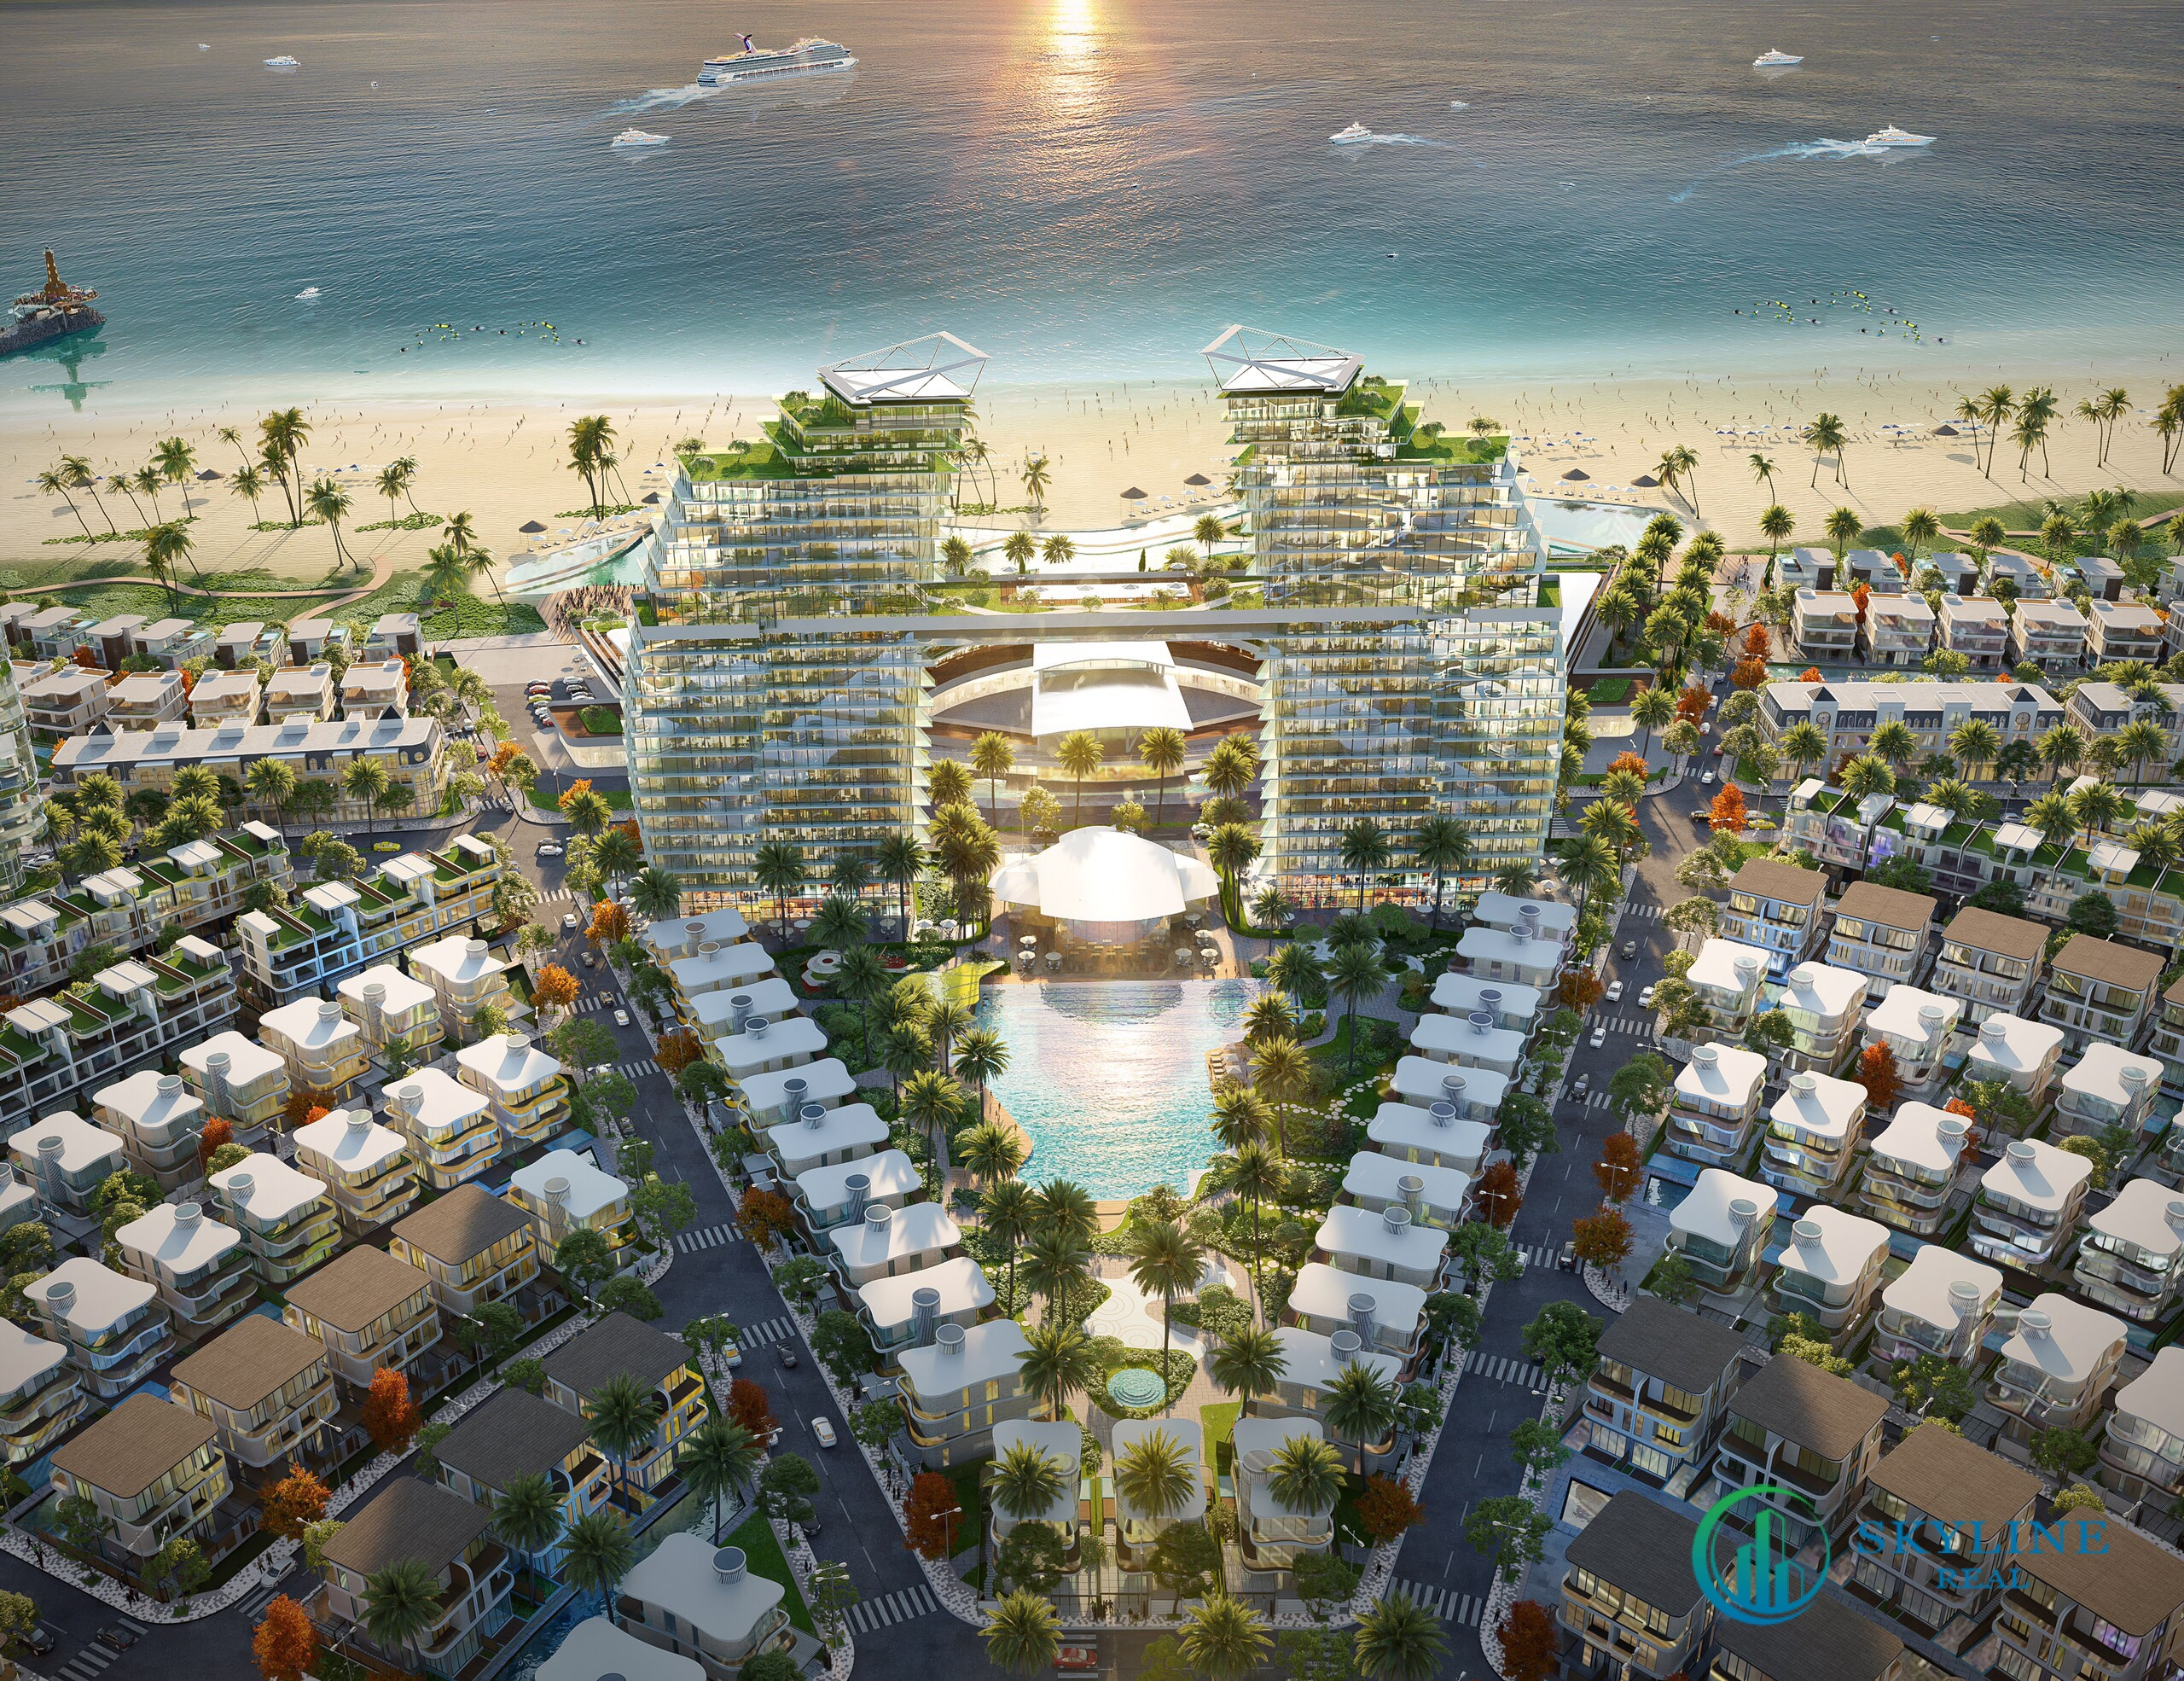 Phối cảnh tổng thể dự án Venezia Beach